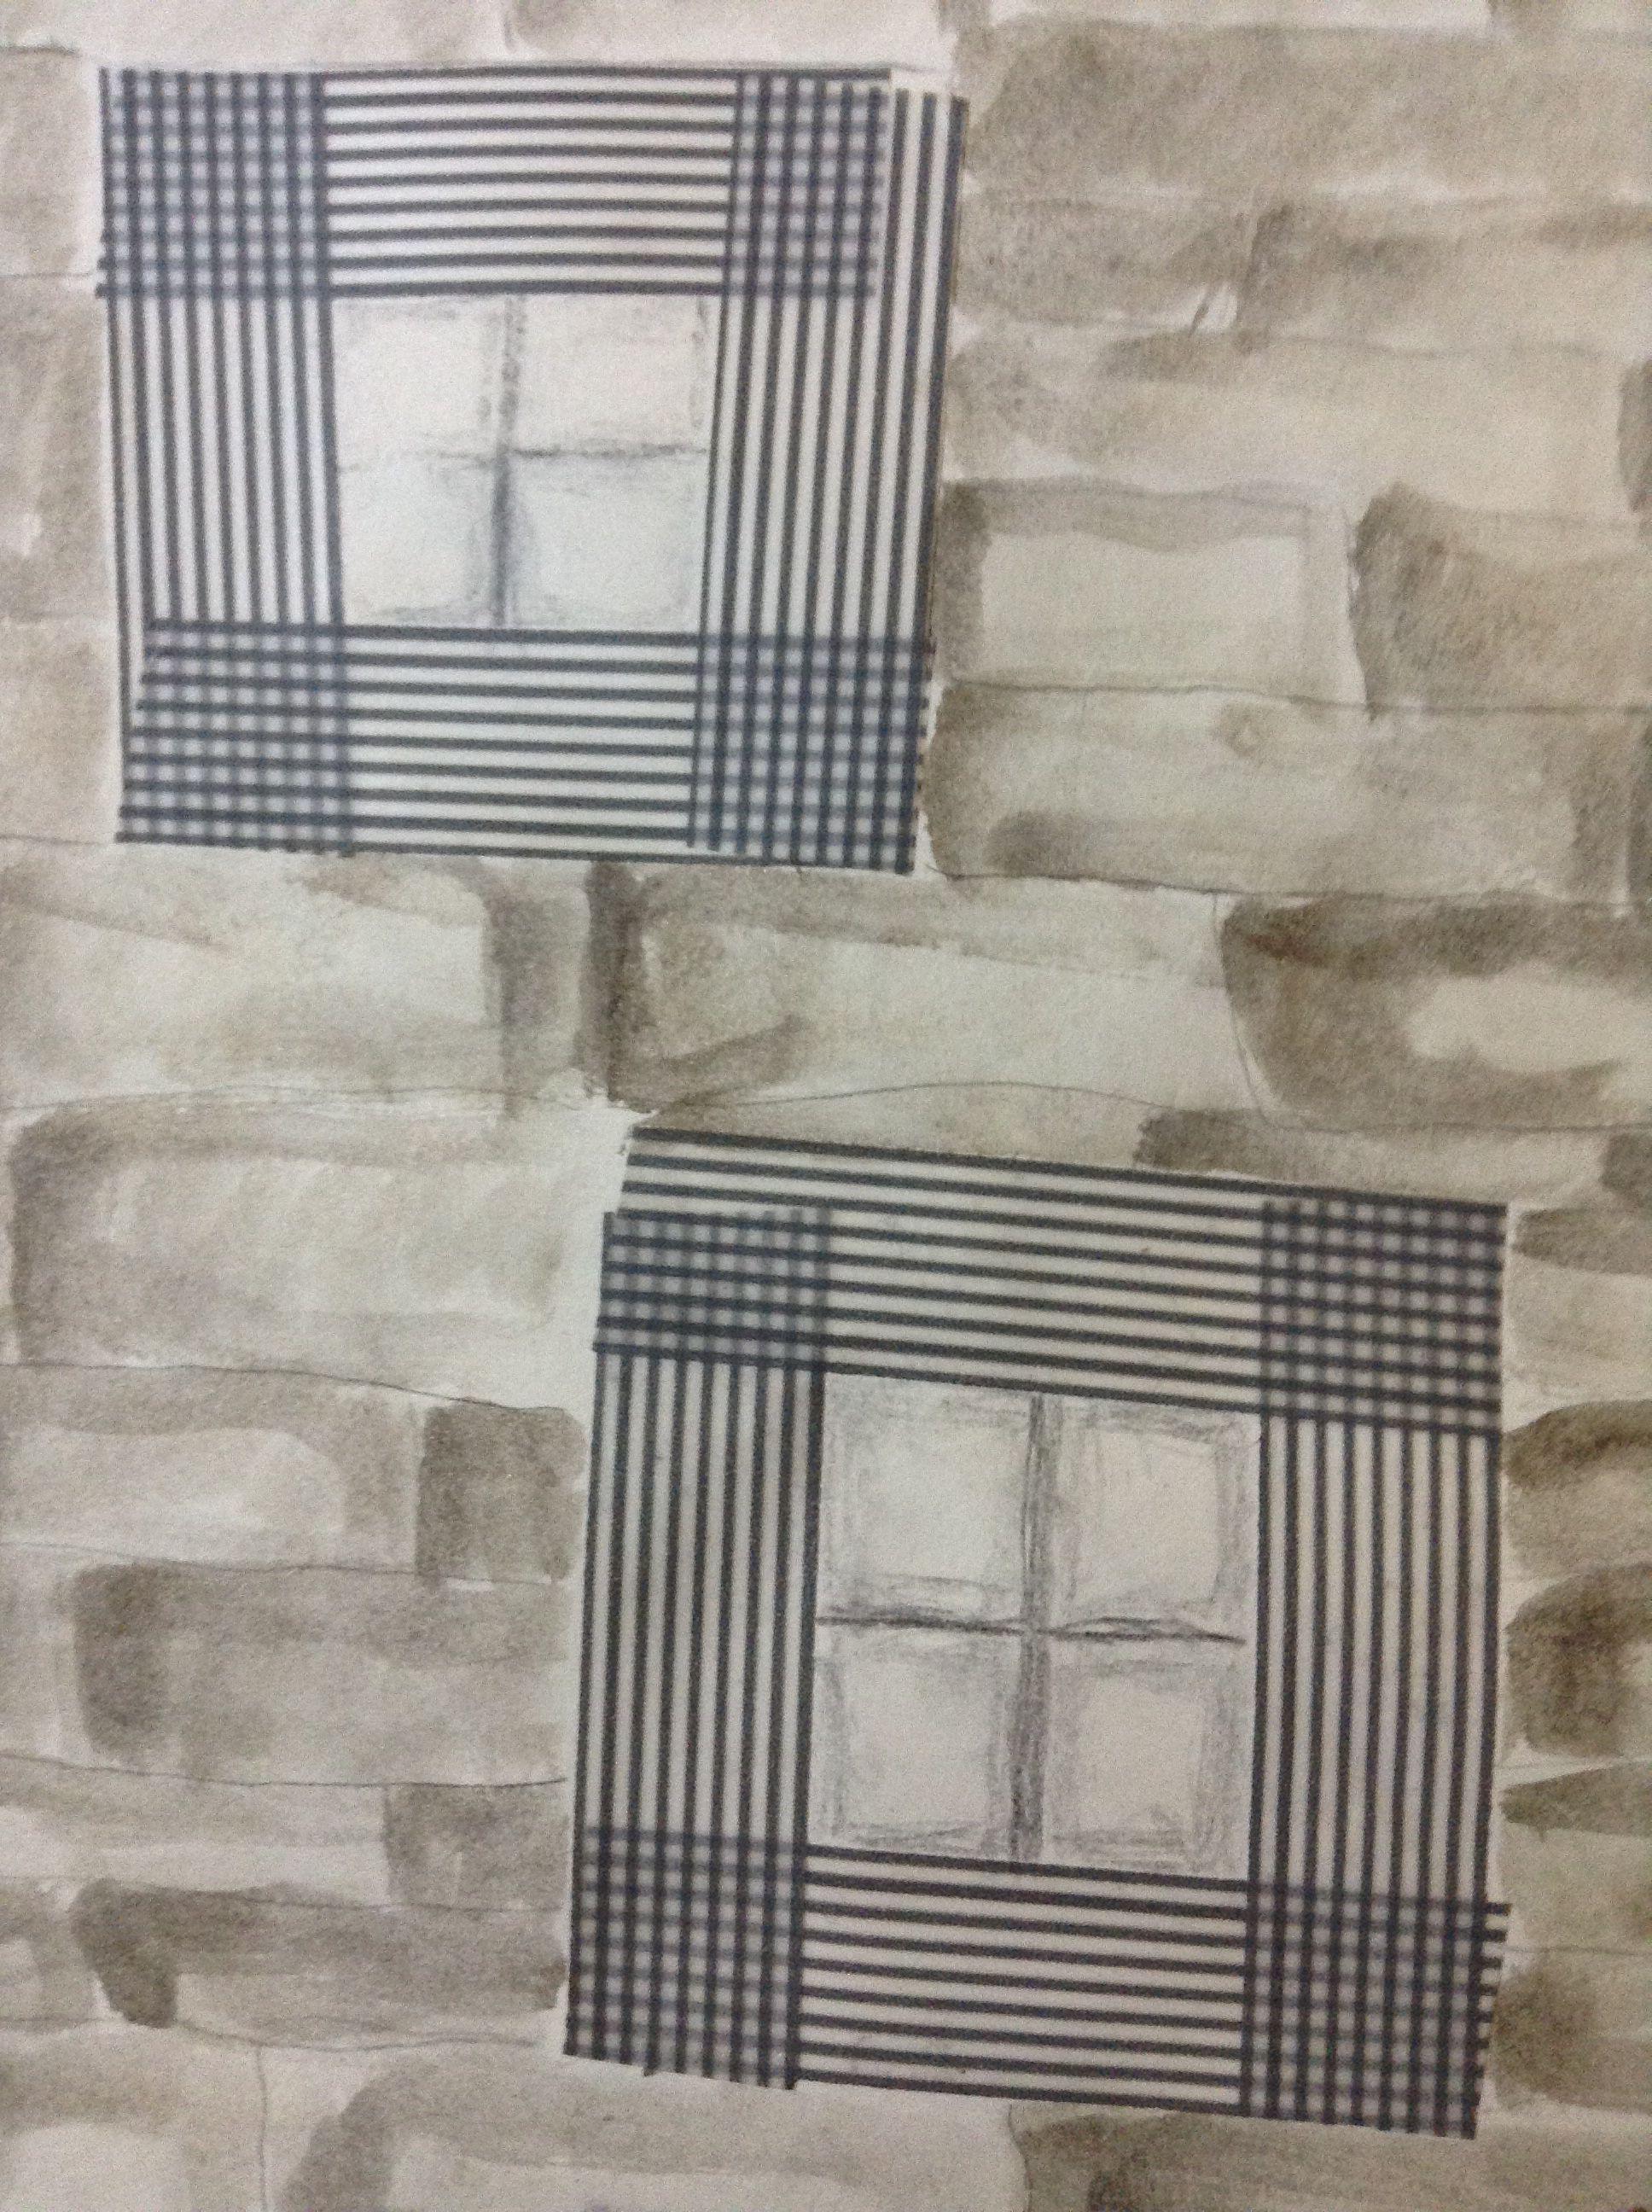 Windows. Gelato wash, graphite, and washi tape.